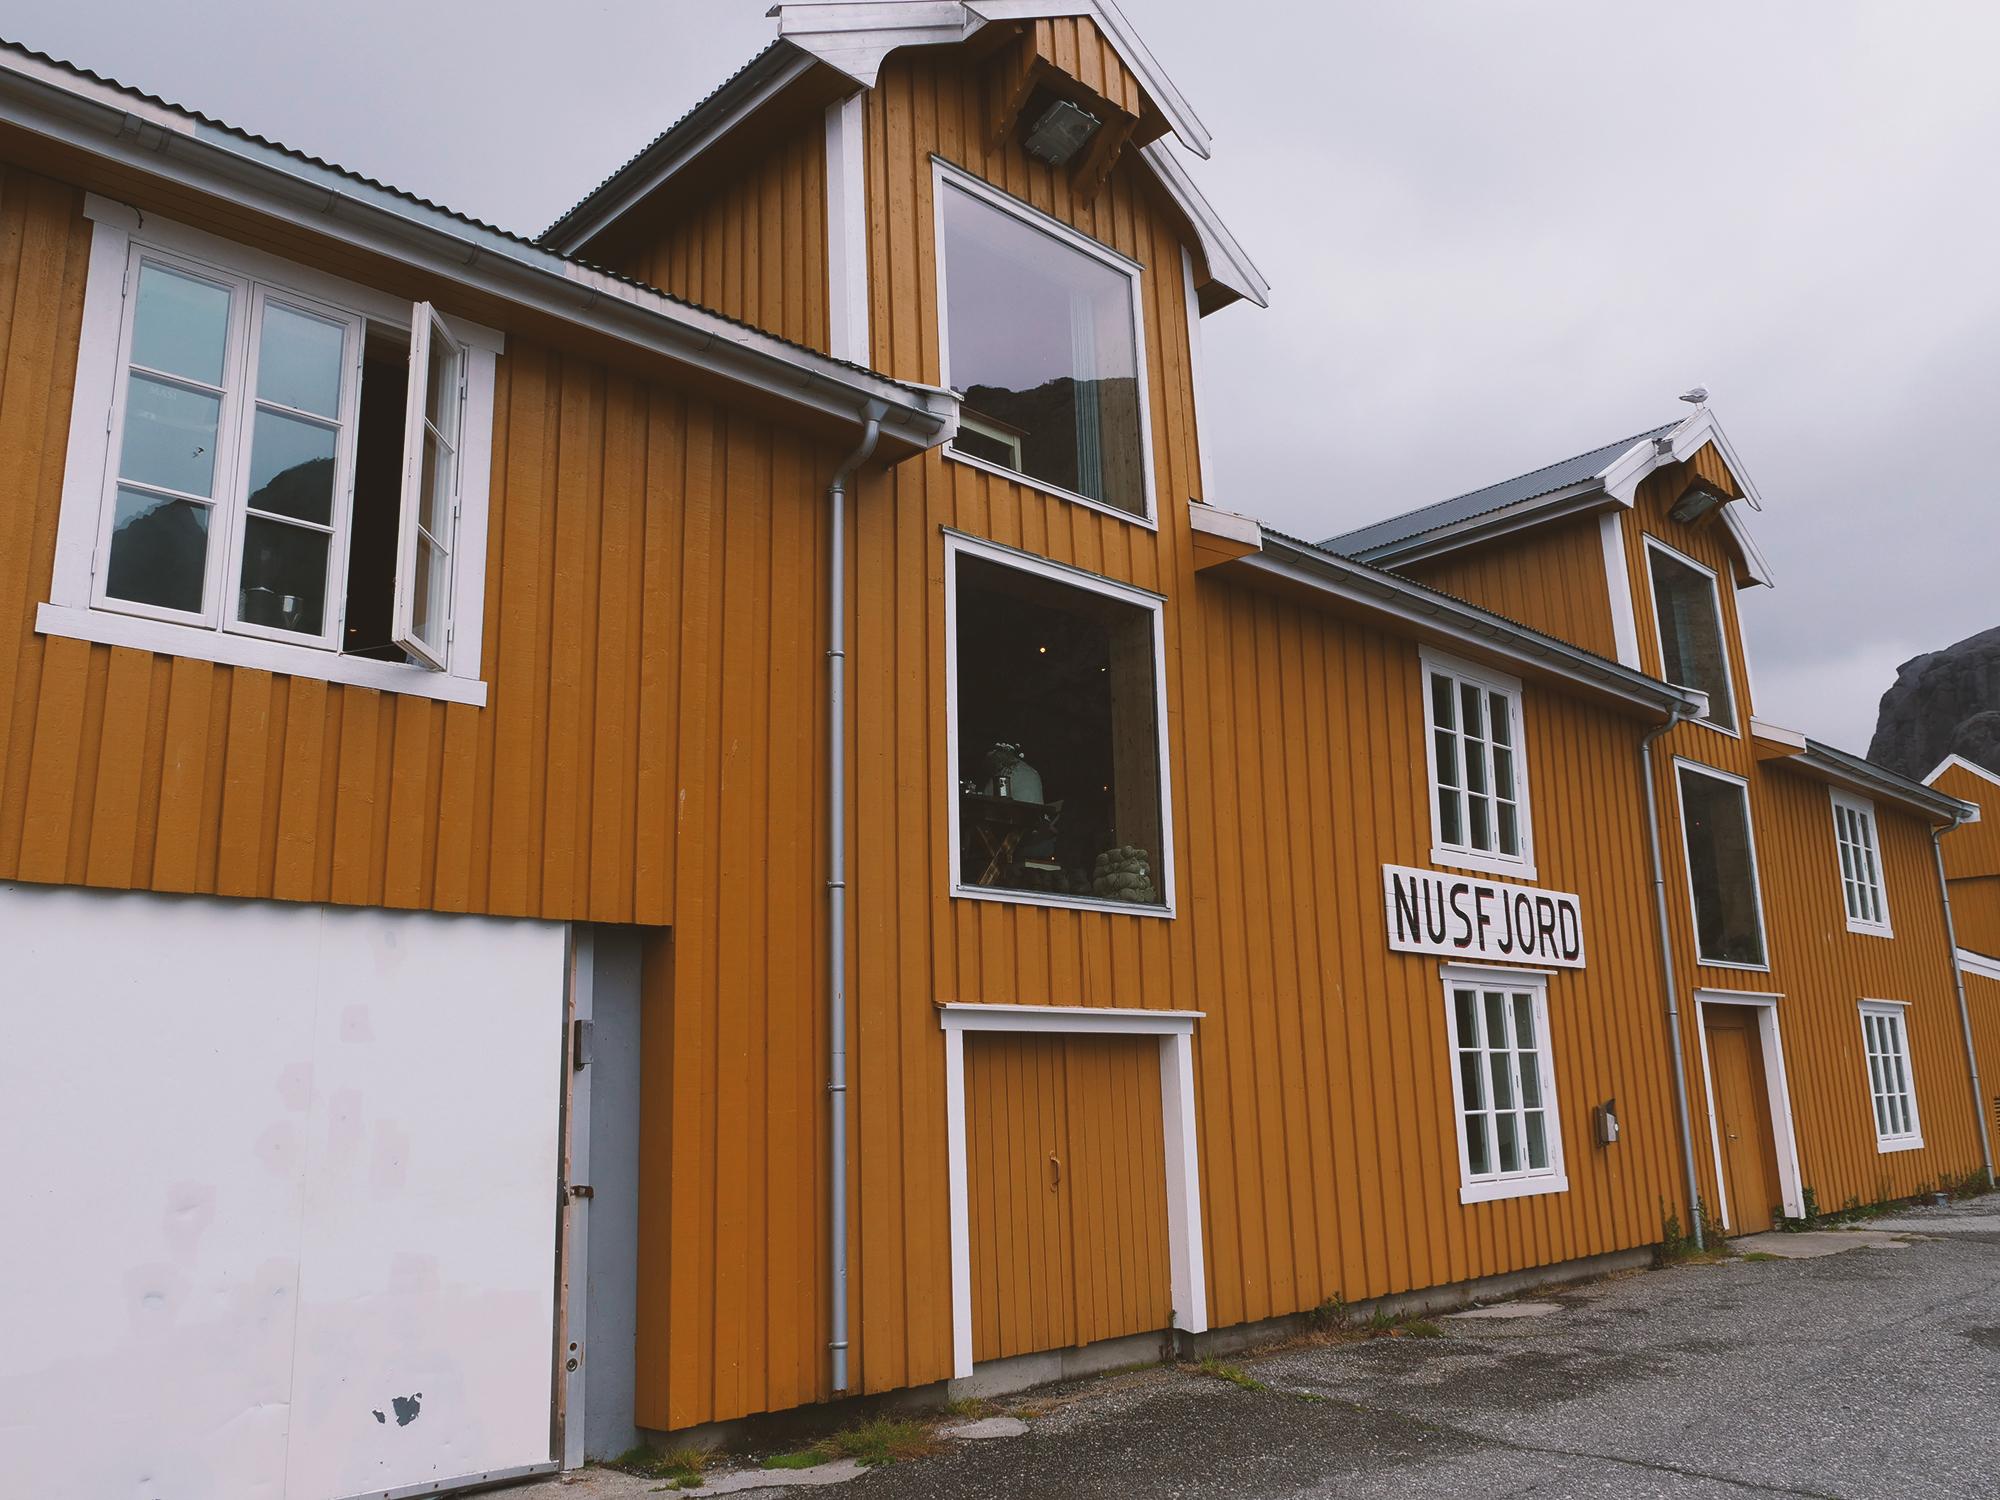 nusfjord nocleg w rorbu